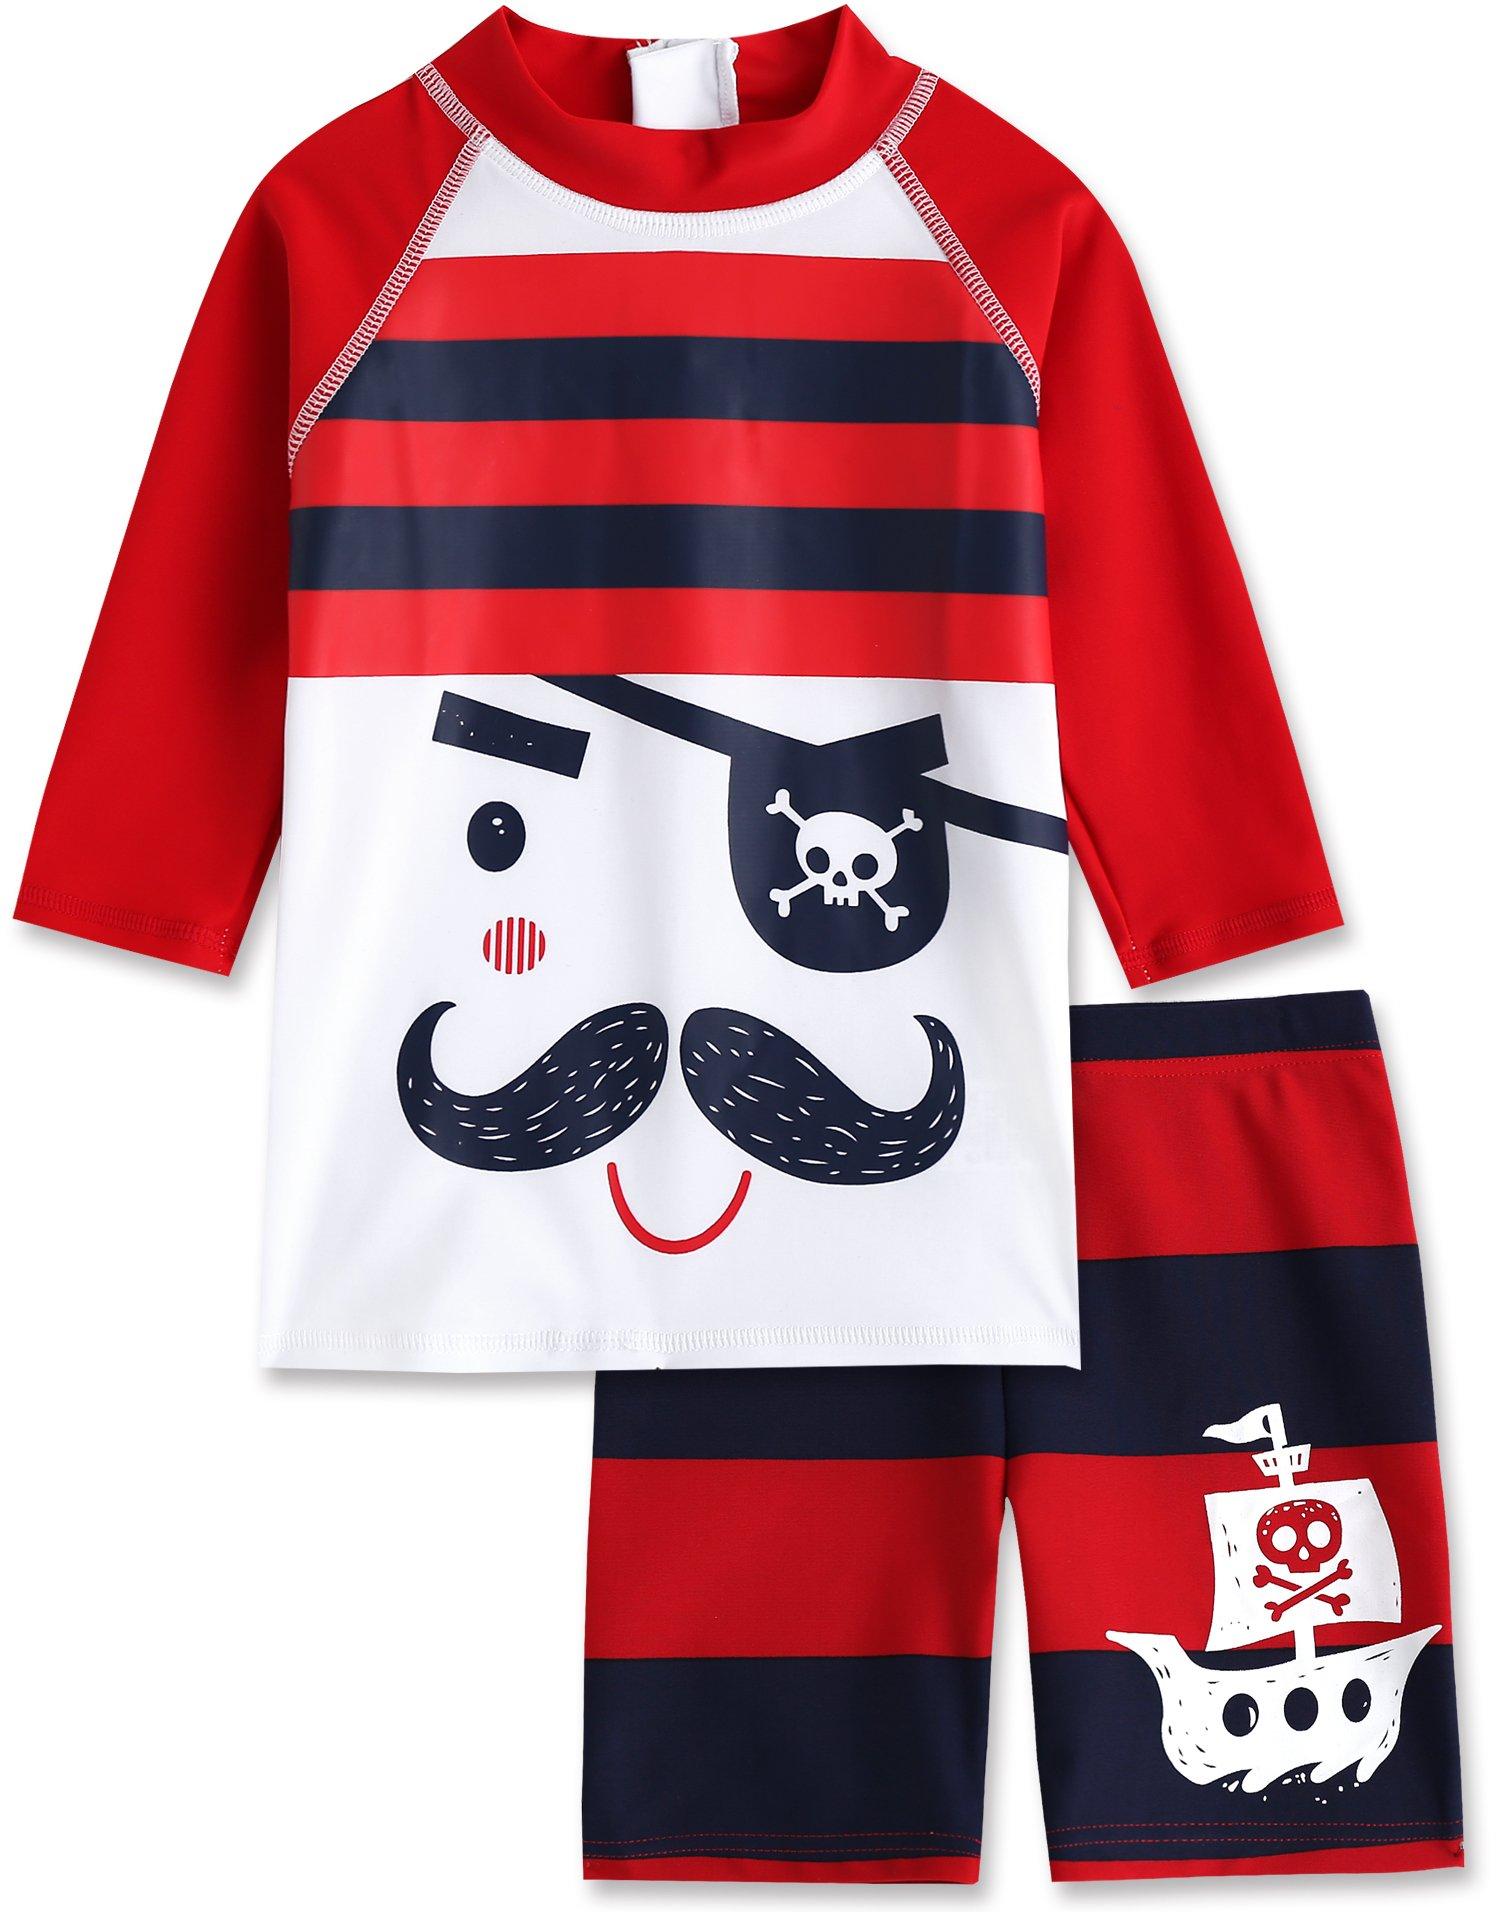 Vaenait baby 2T-7T Infant Boys Rashguard Swimsuit Captain XL